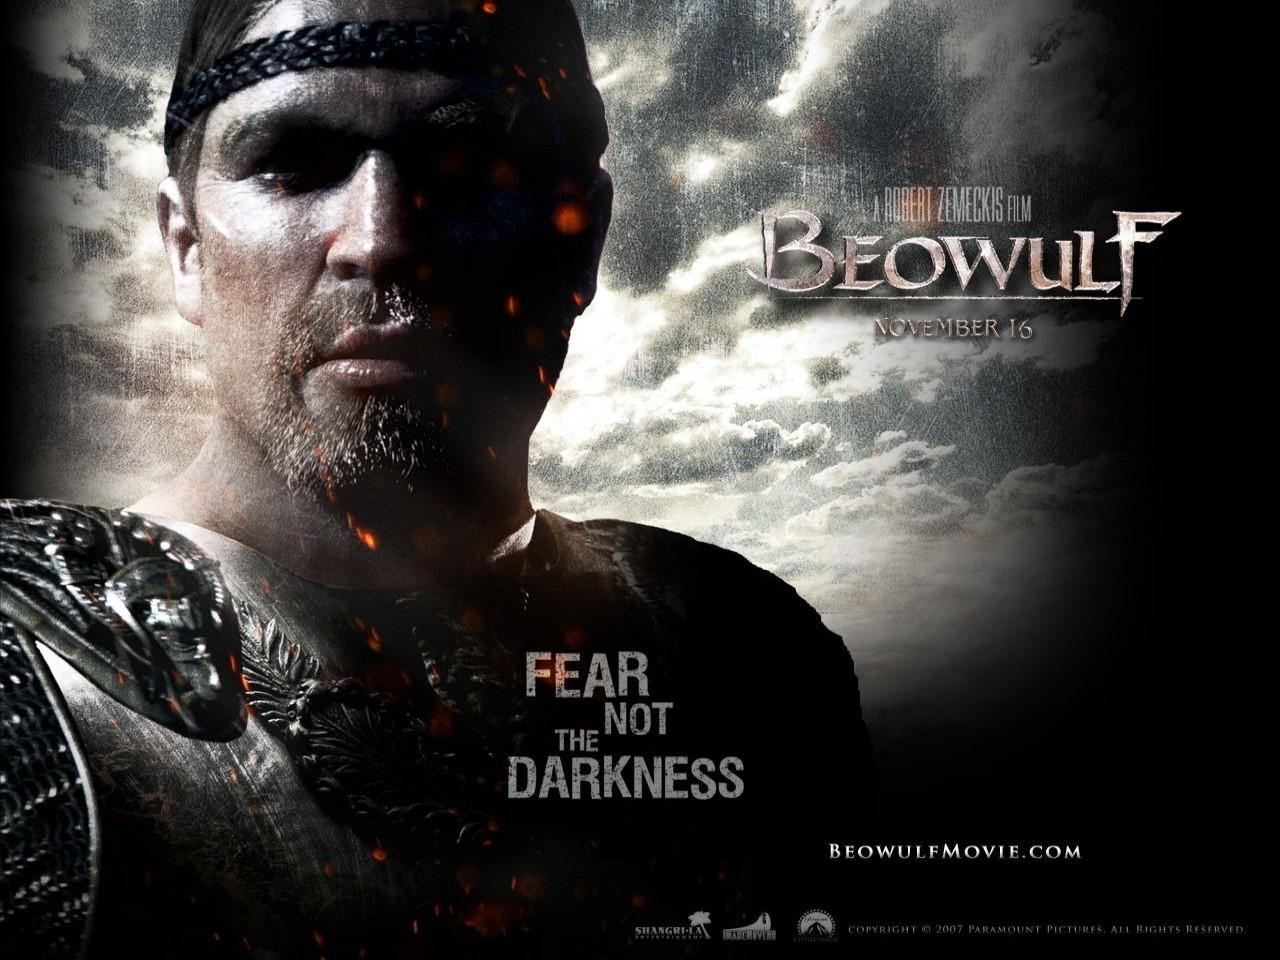 Wallpaper del film La leggenda di Beowulf (2007)